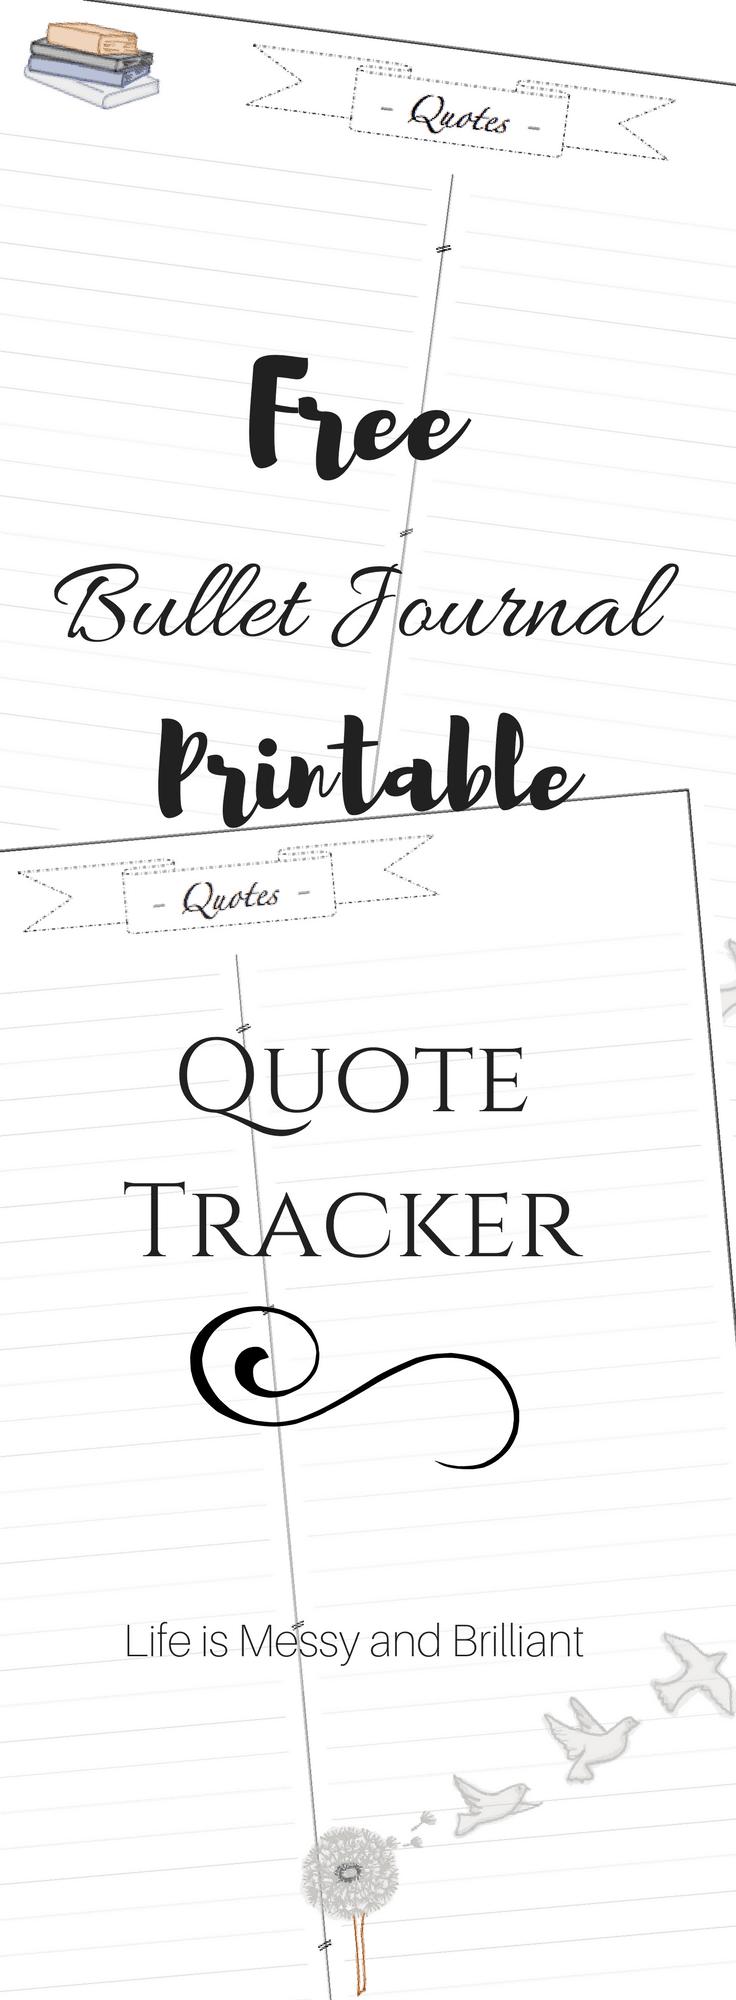 bullet journal printables pdf free